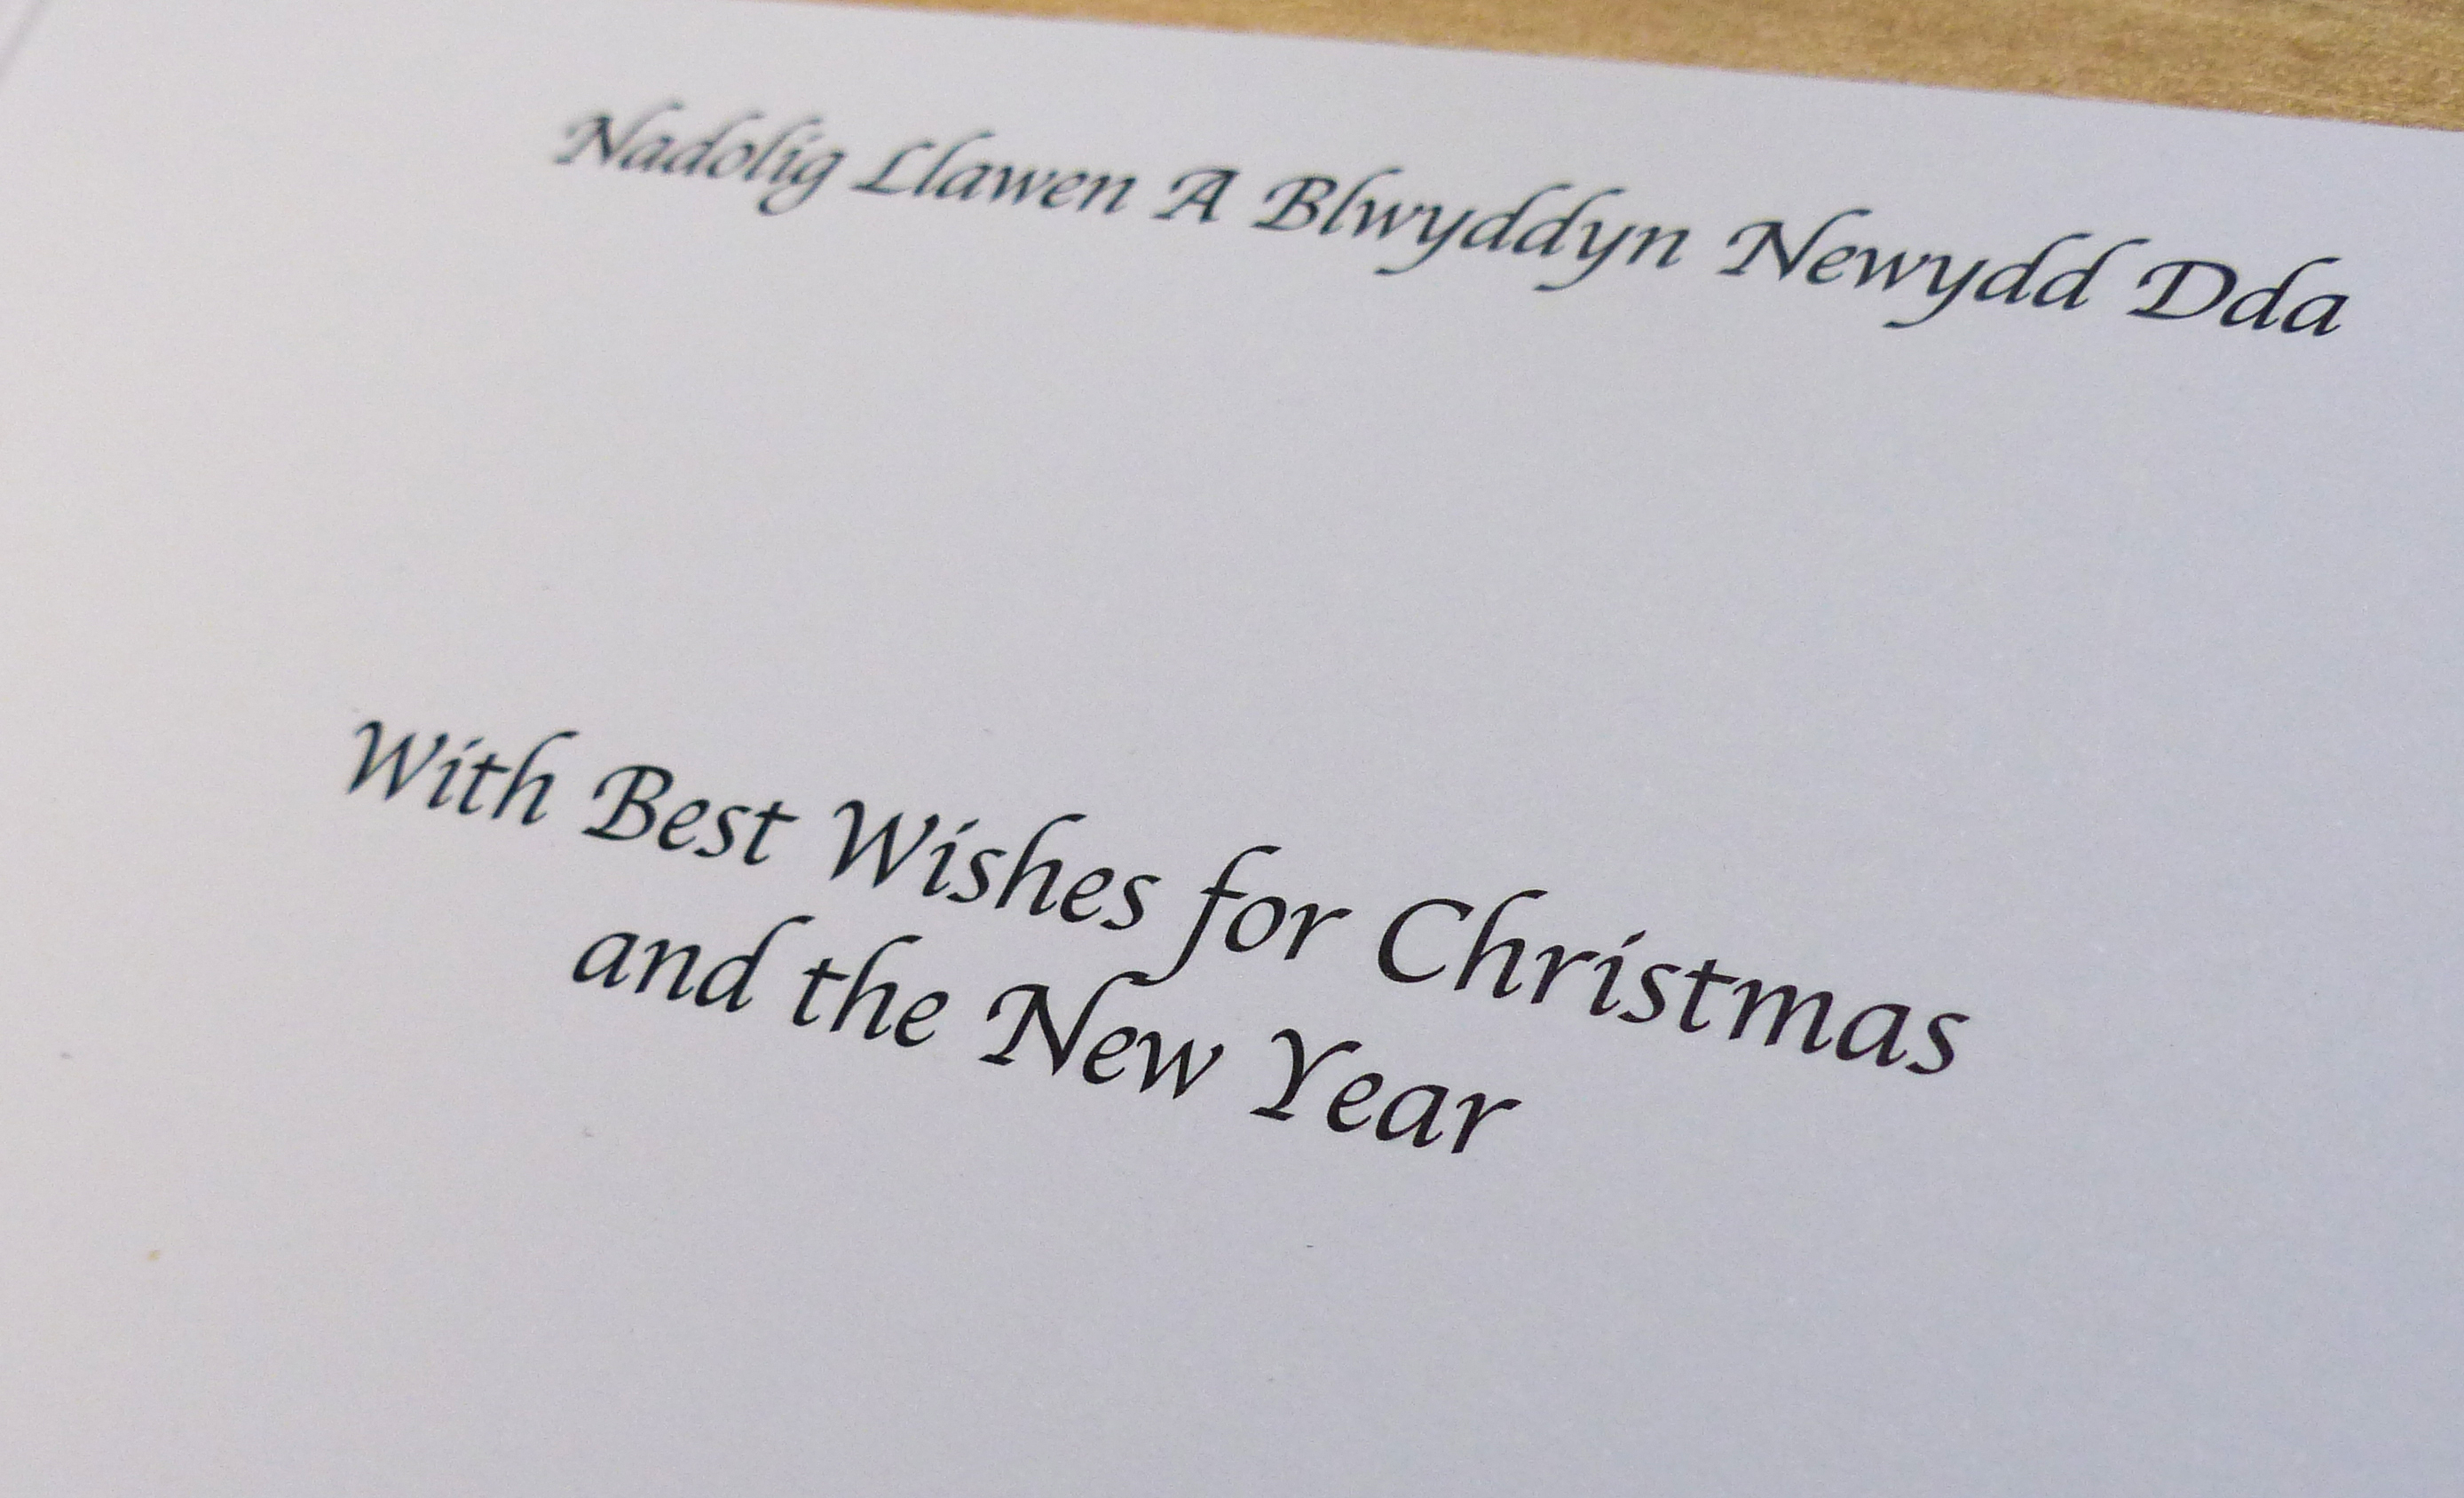 Welshpool and Llanfair christmas card